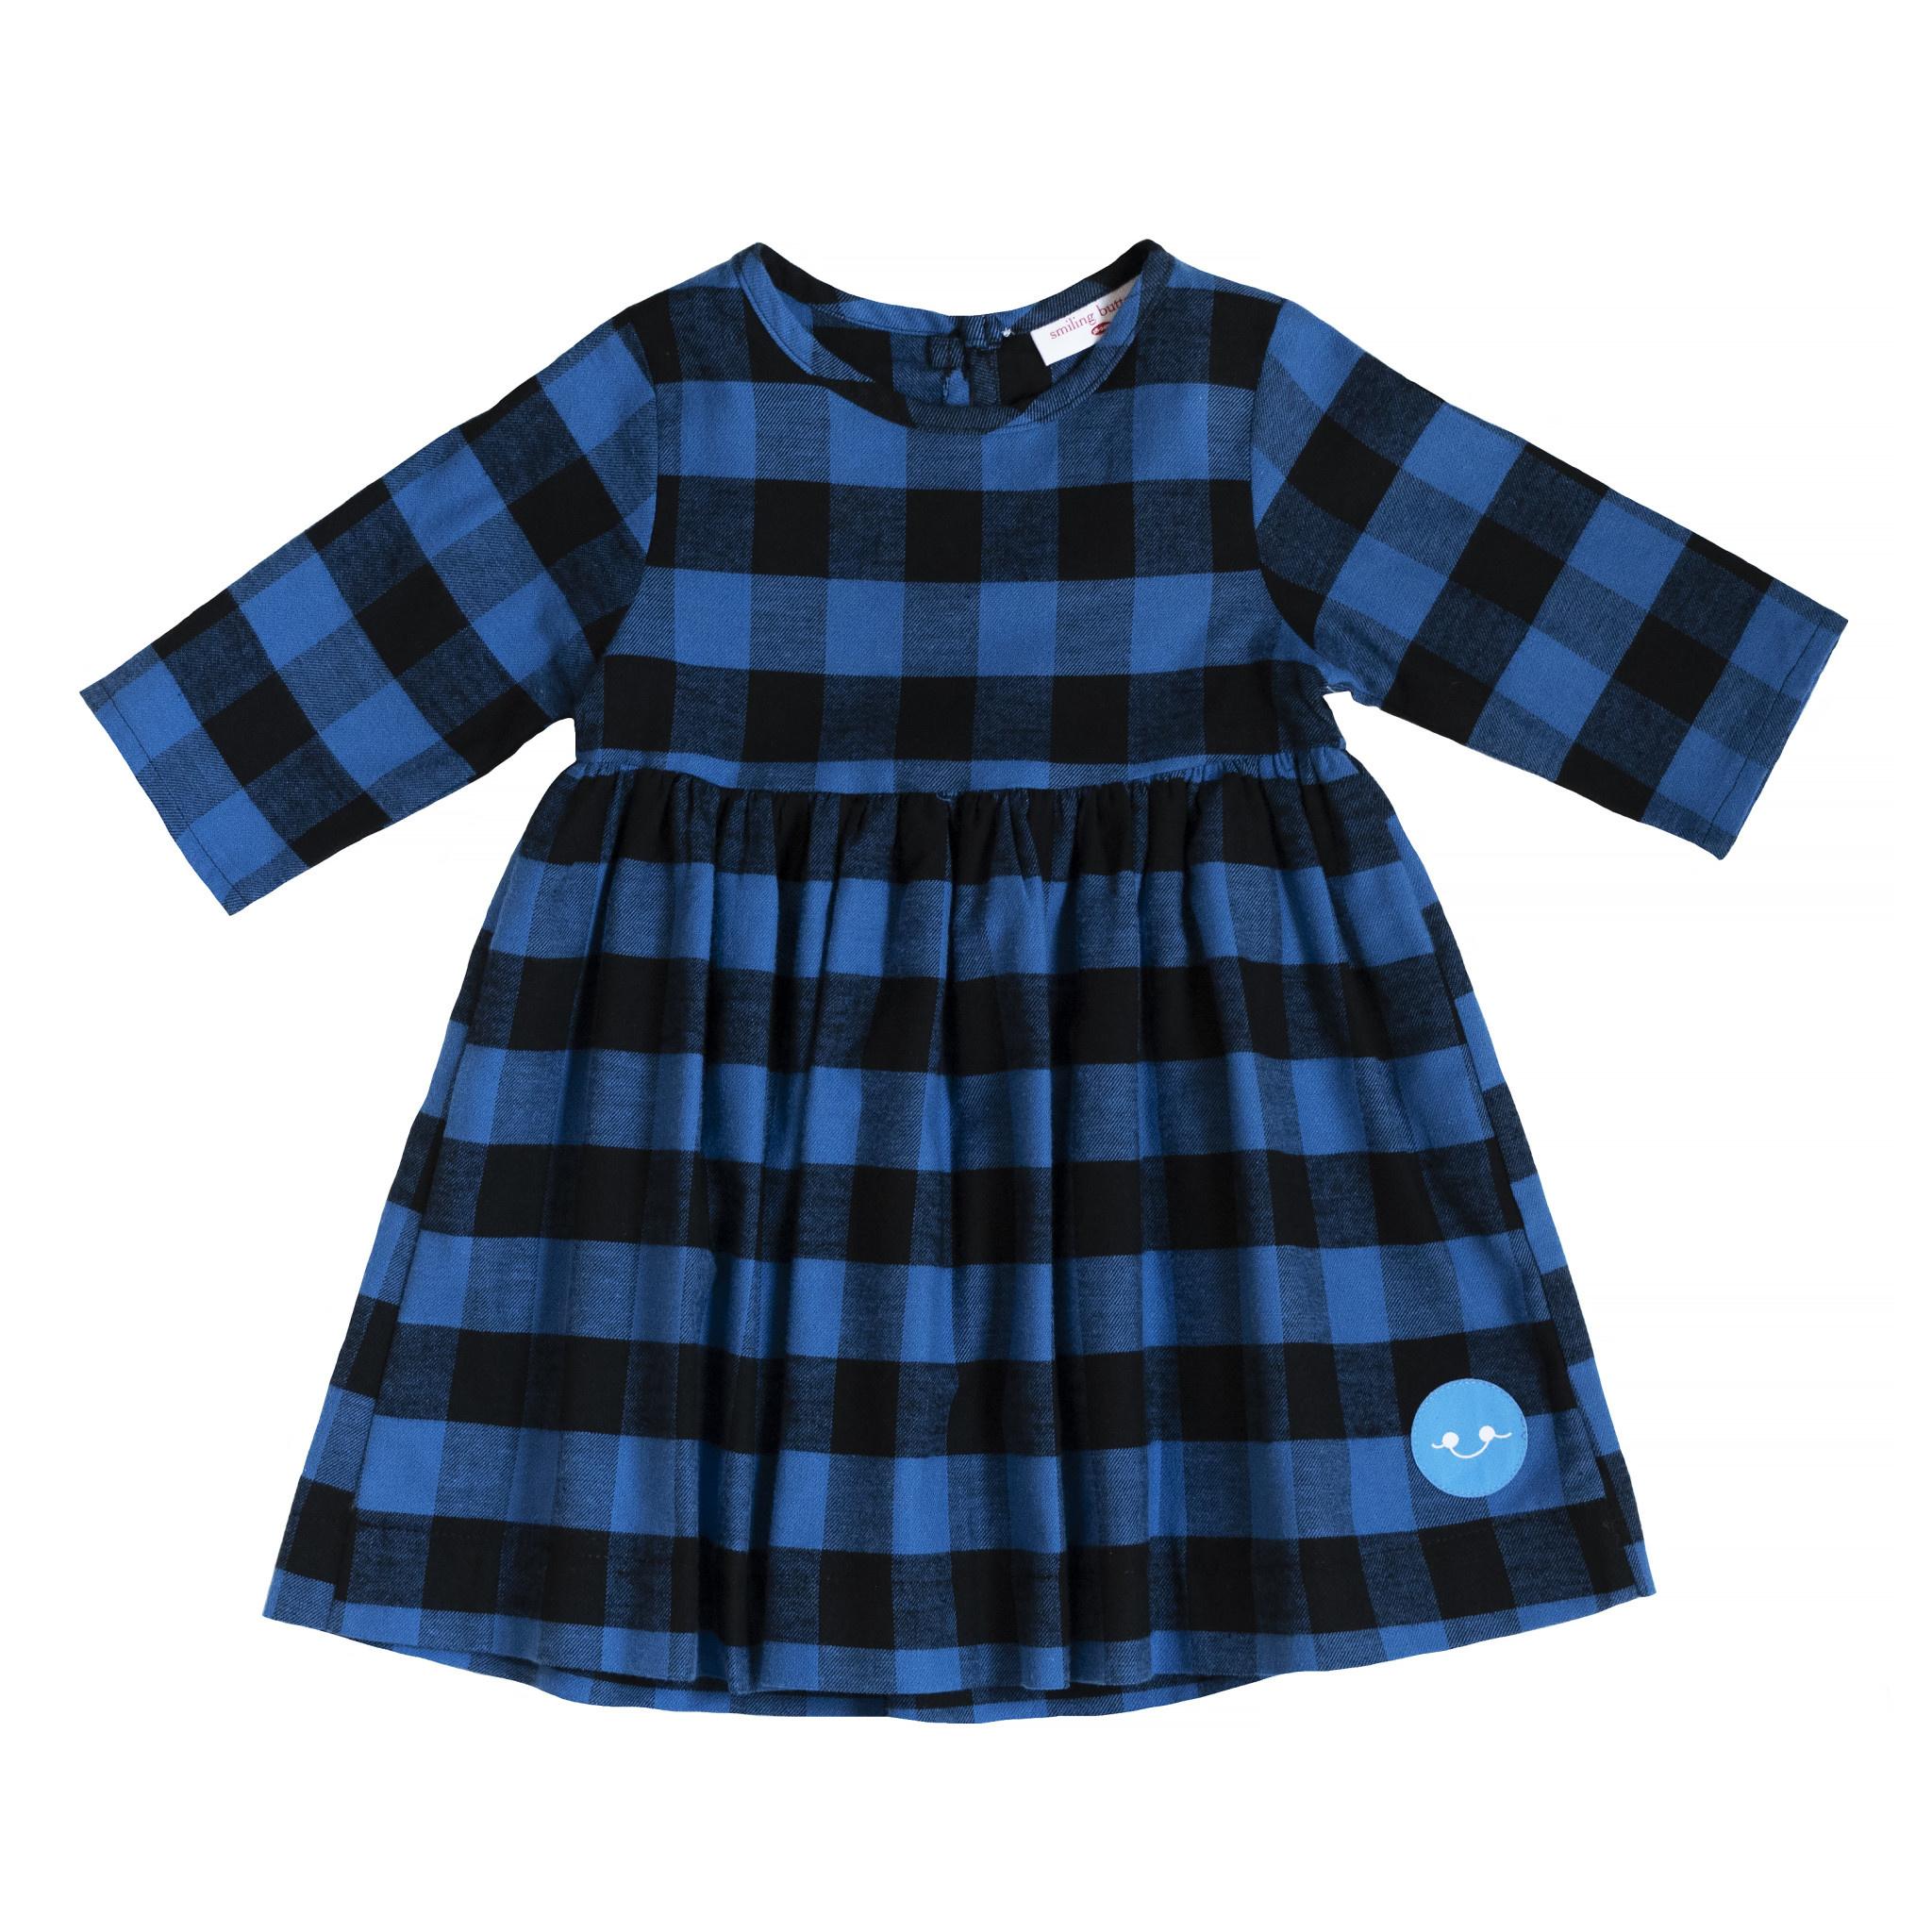 Smiling Button Winnie Dress - Blue/Black Flannel Buffalo Check